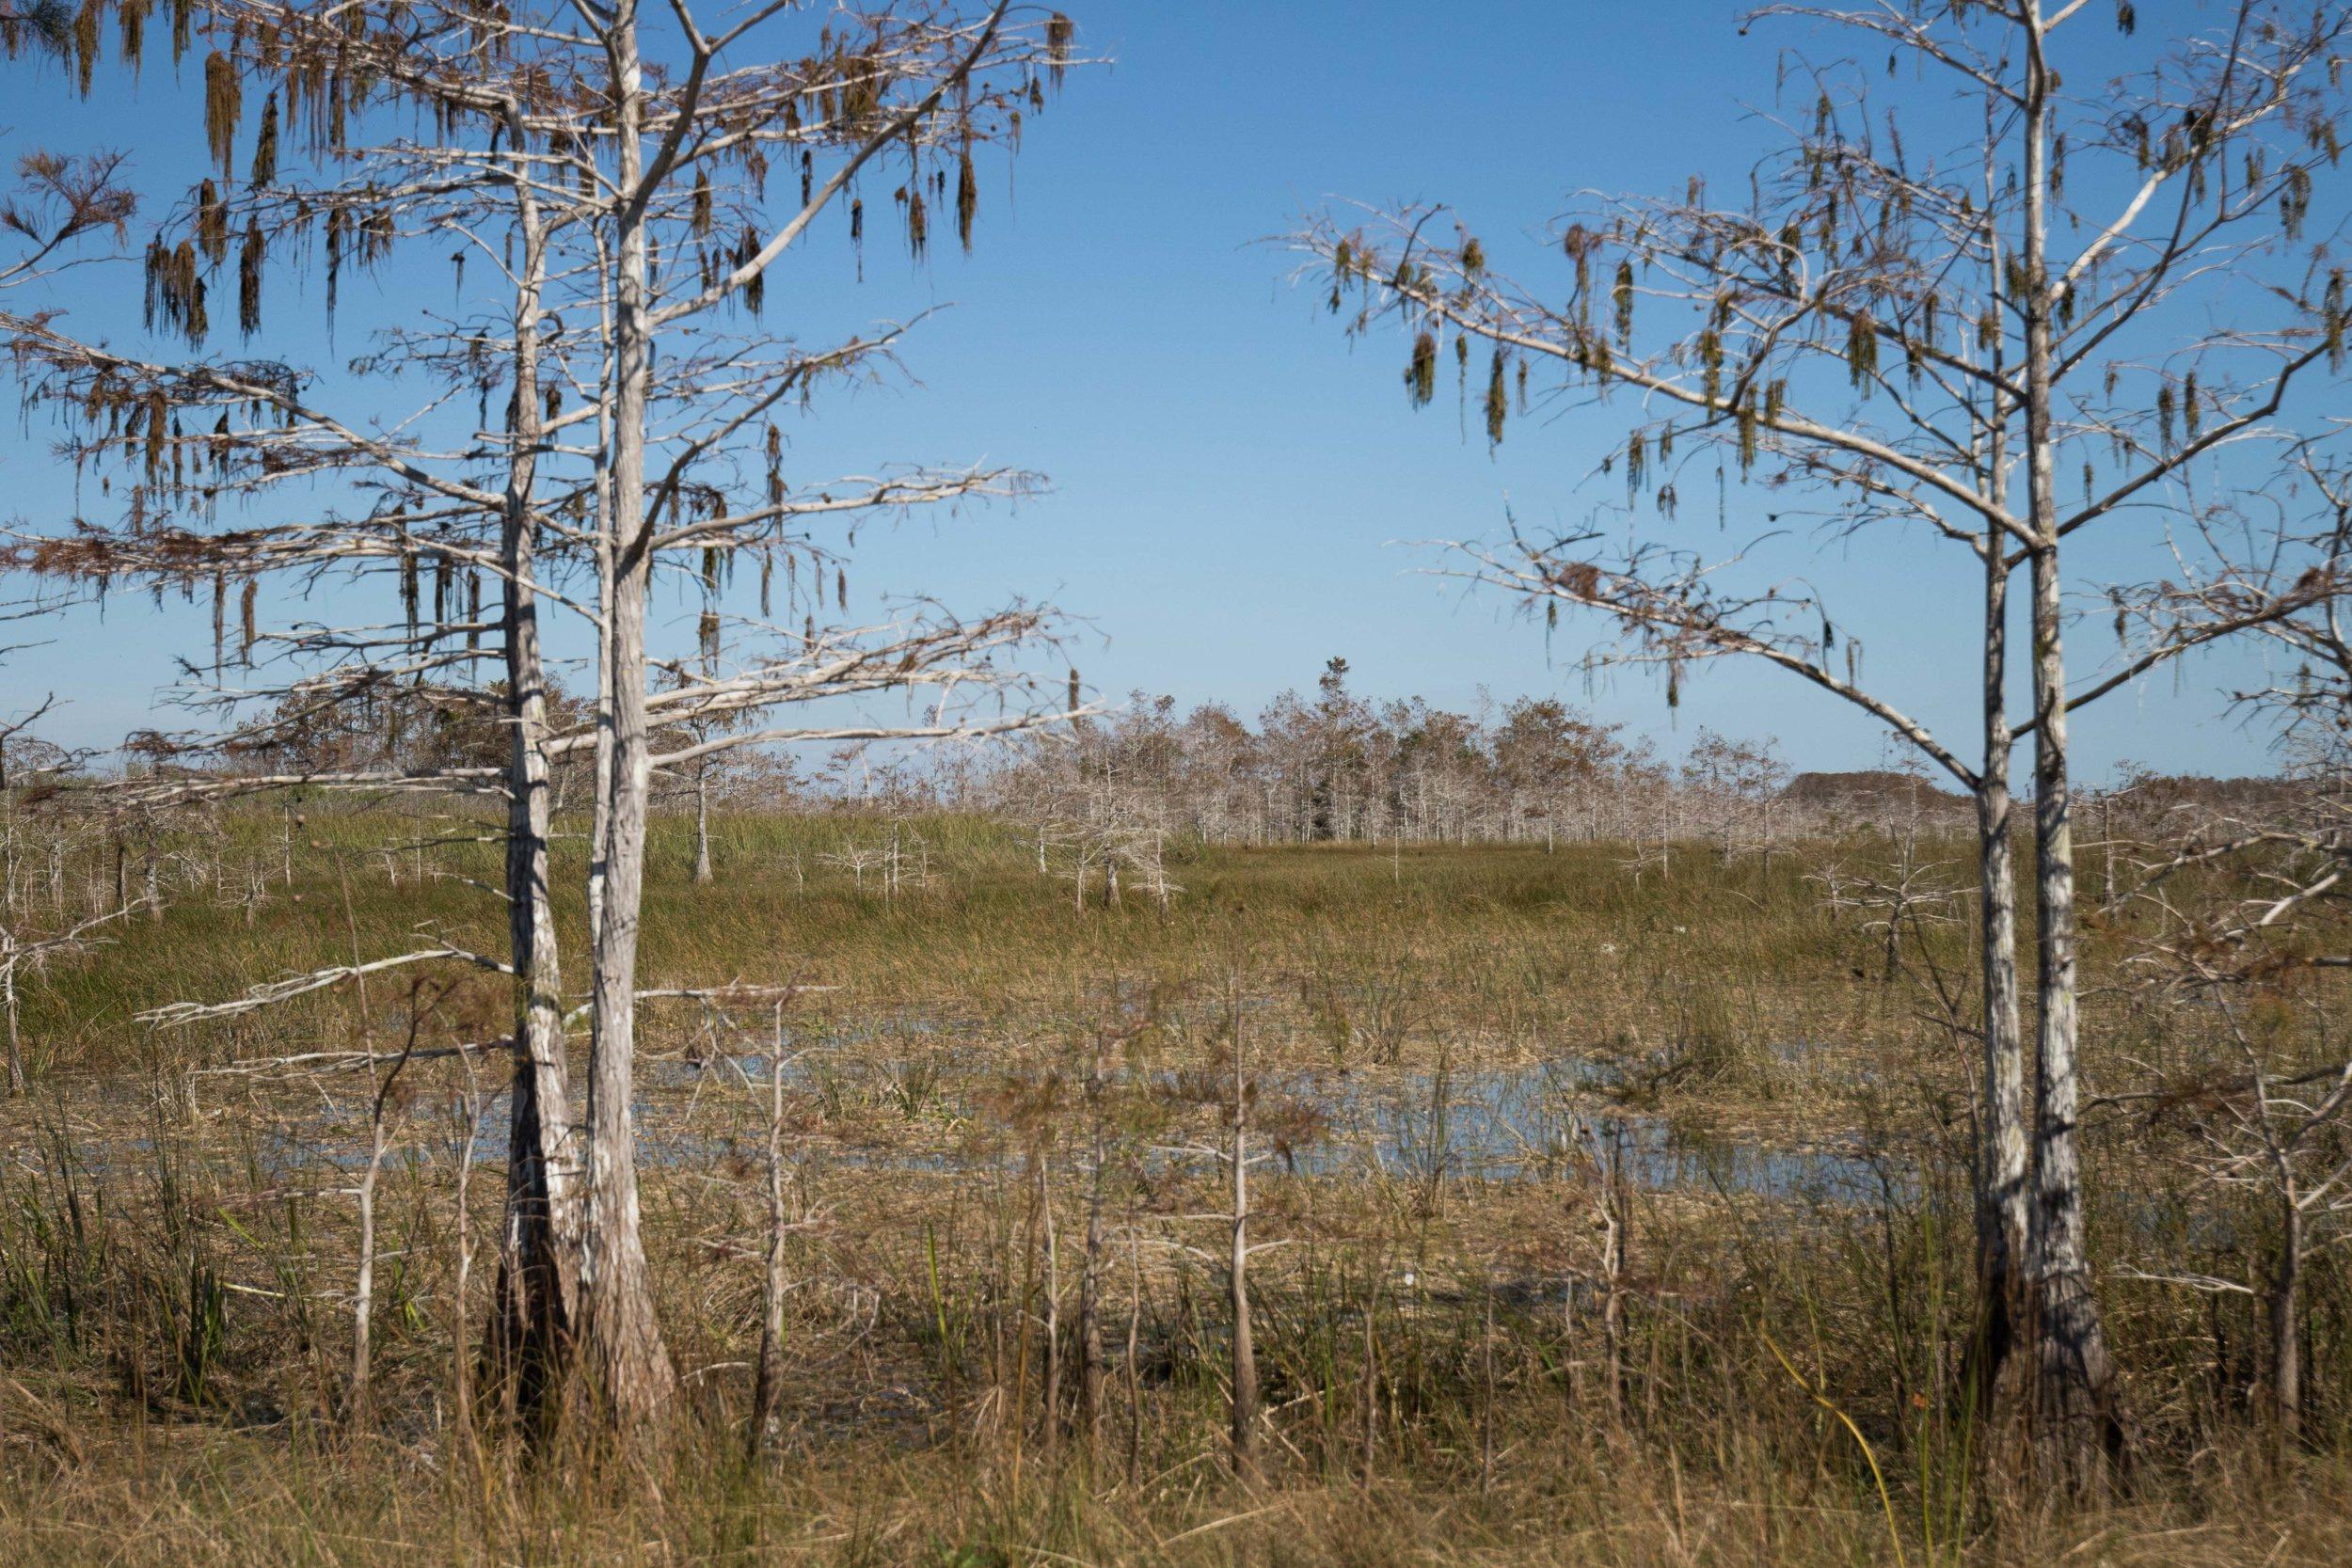 2019_Everglades-229.jpg